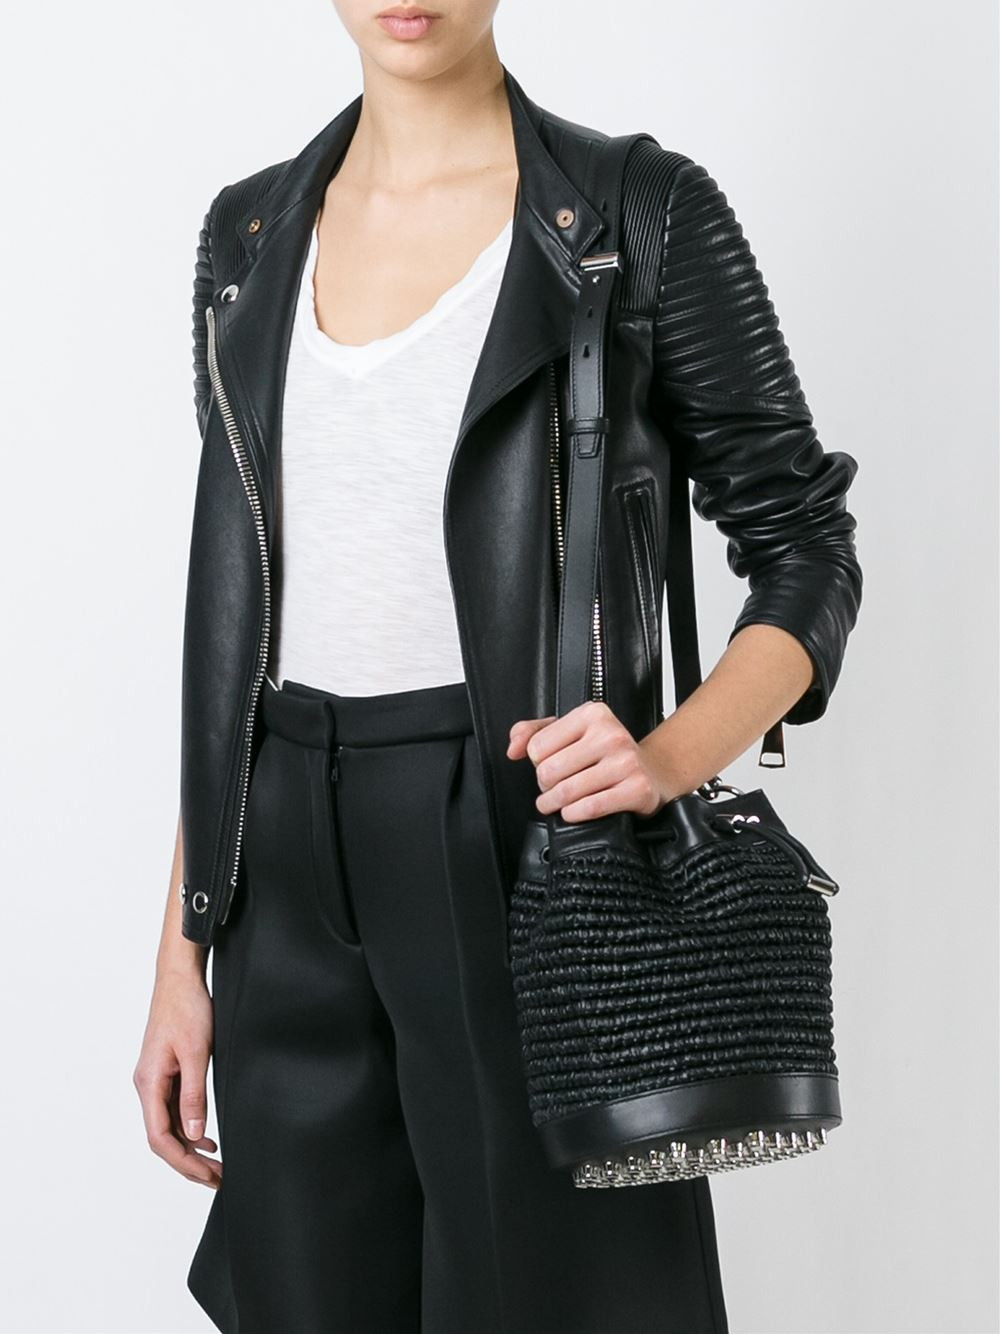 Alexander Wang Black raffia and leather 'Alpha' woven crossbody bag $550